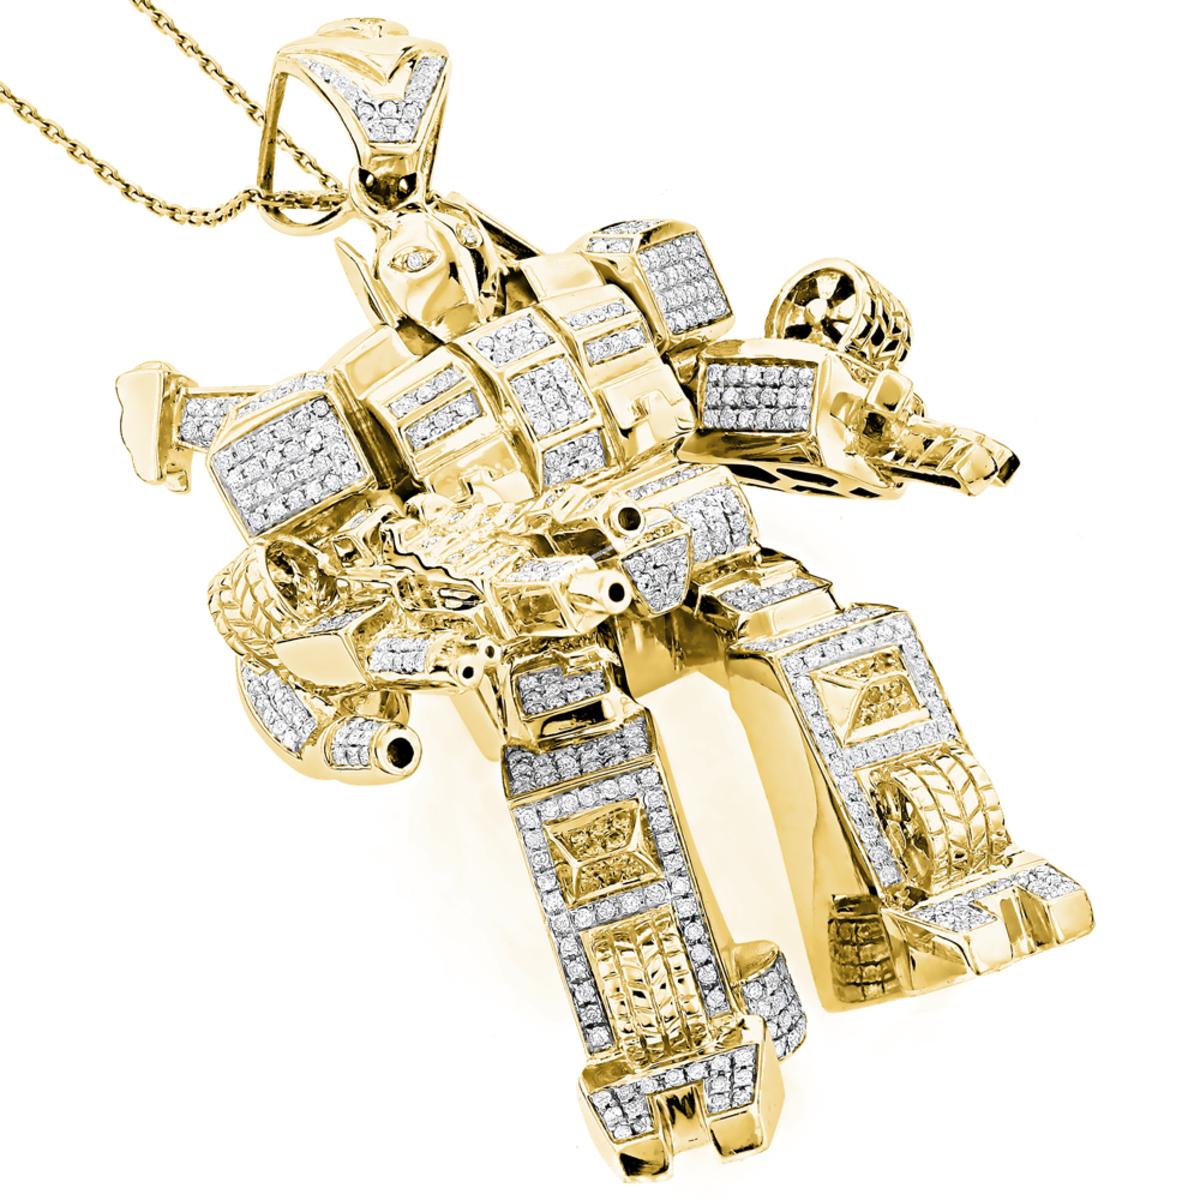 Custom jewelry 3 d transformer diamond pendant 125ct gold plated aloadofball Image collections